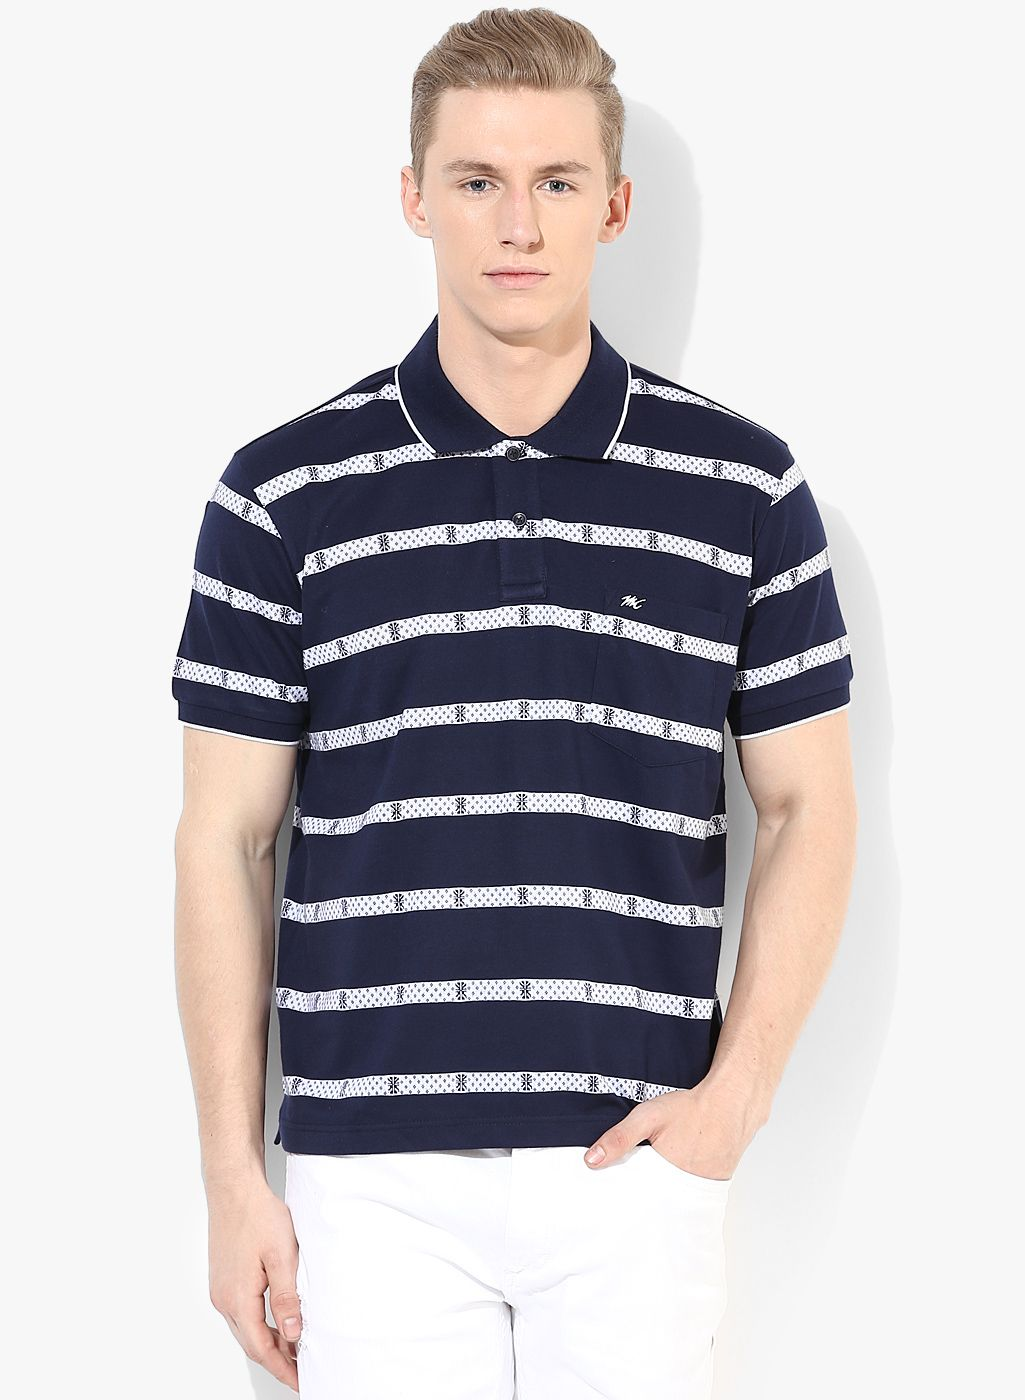 bb6abc2b Jabong Us Polo T Shirts - DREAMWORKS